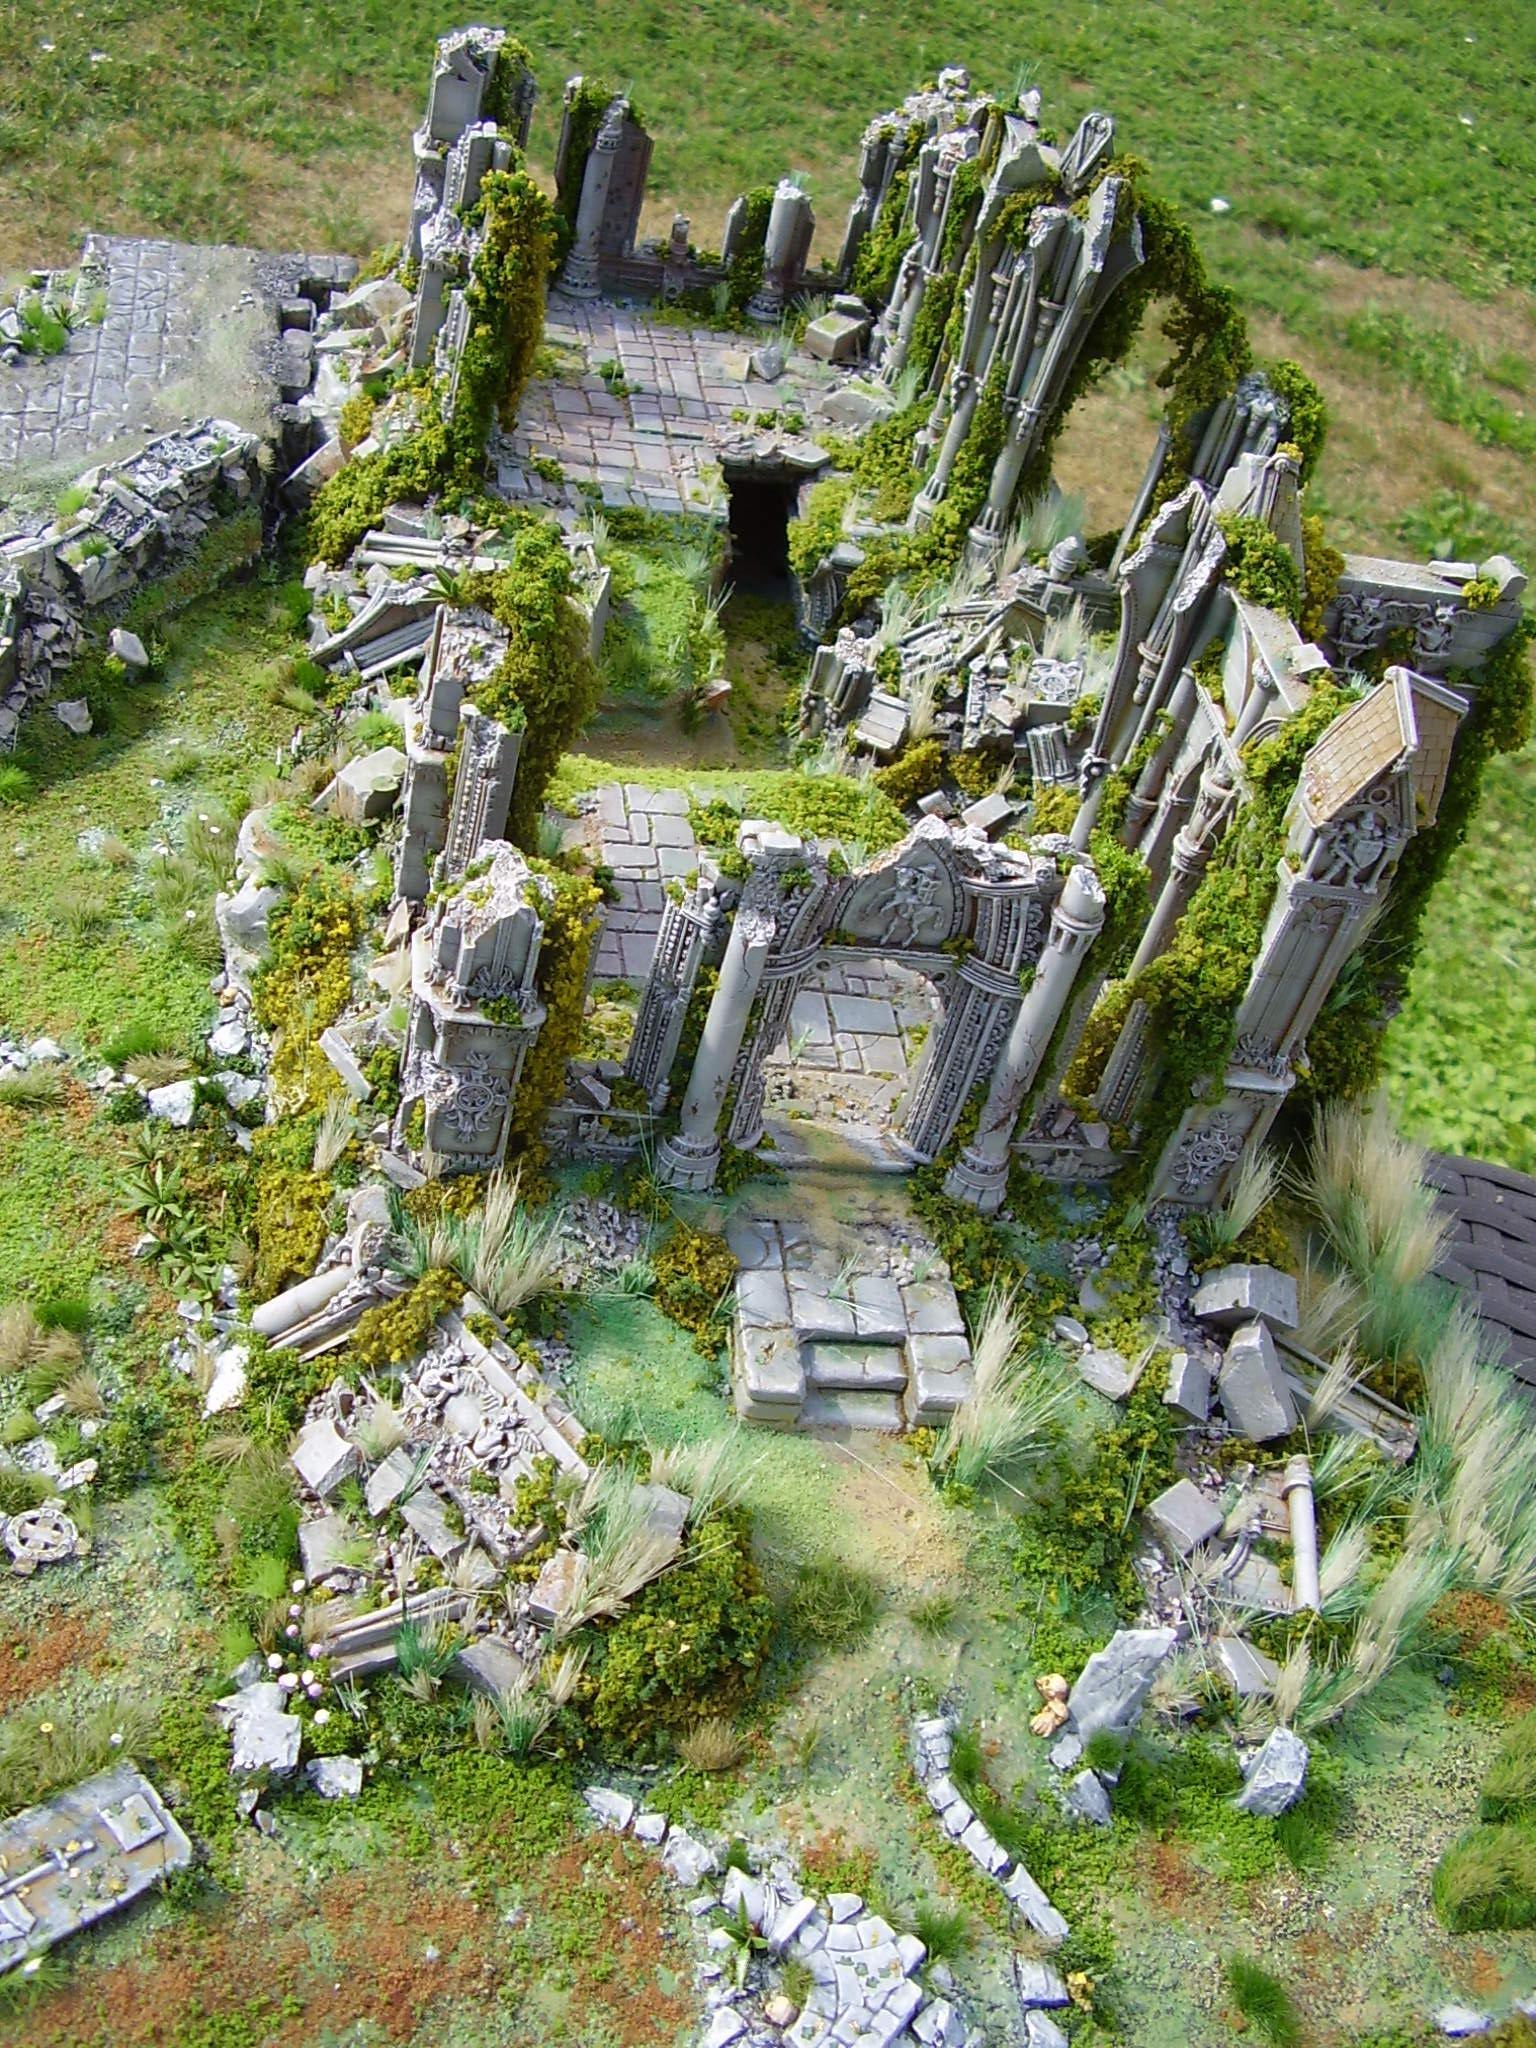 Armorcast Ruine Kirche Diorama